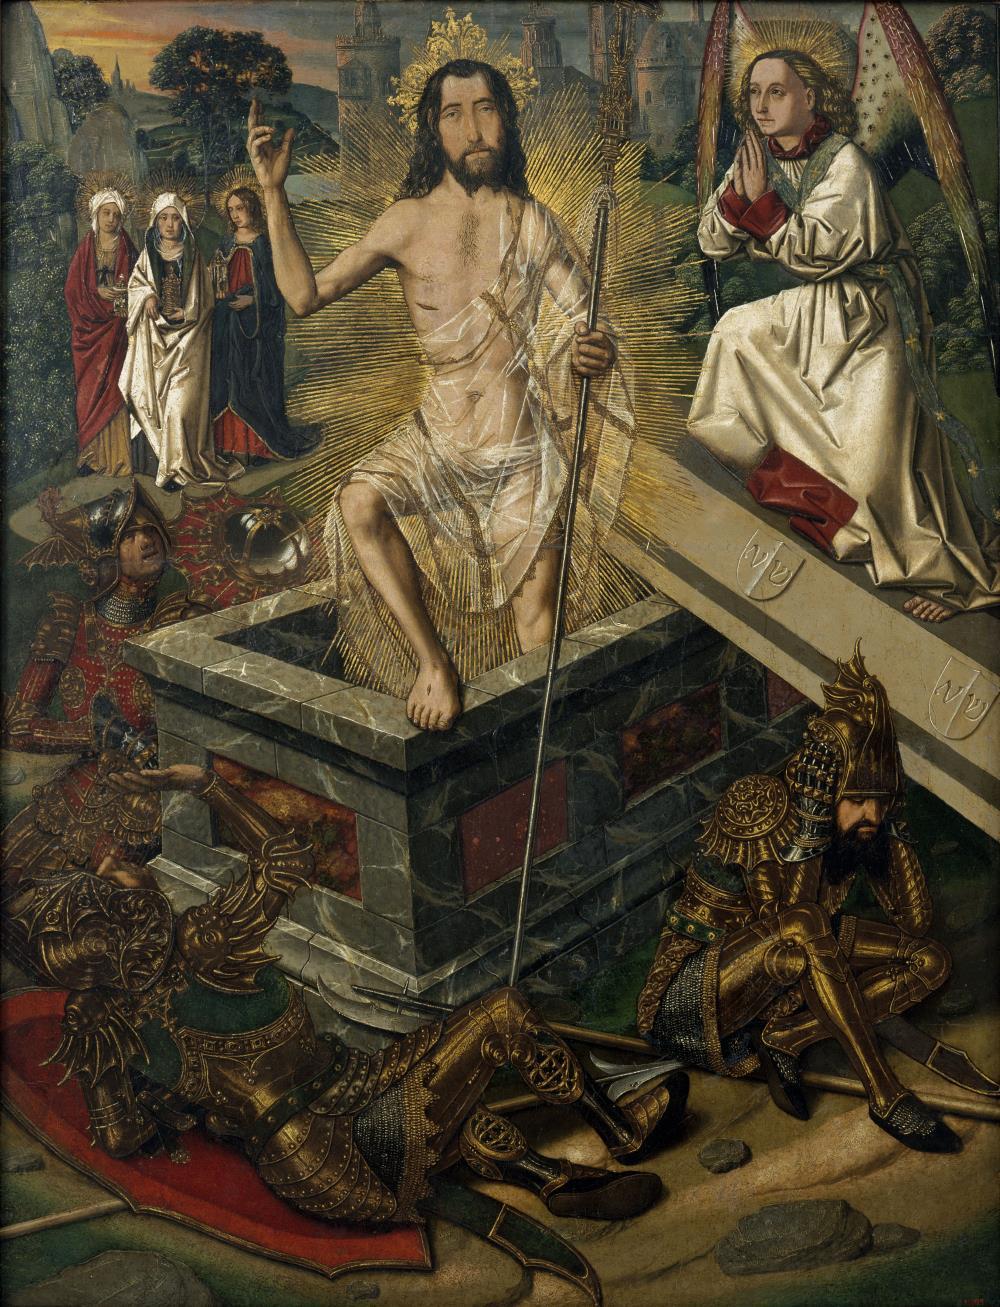 Bartolomé Bermejo, Resurrection, c. 1475